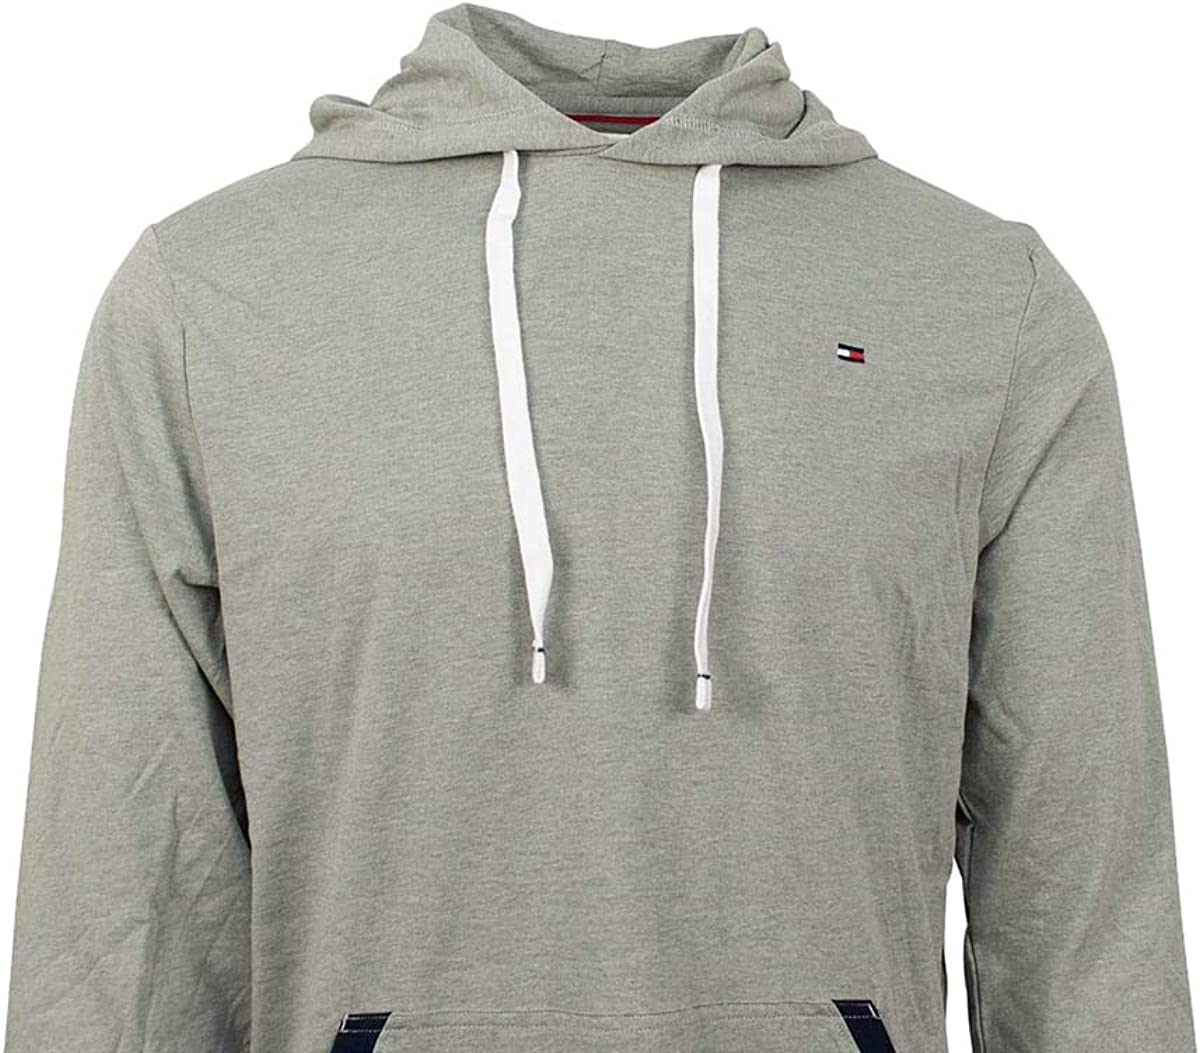 Tommy Hilfiger Mens Light Weight Long Sleeve Hoodie Shirt